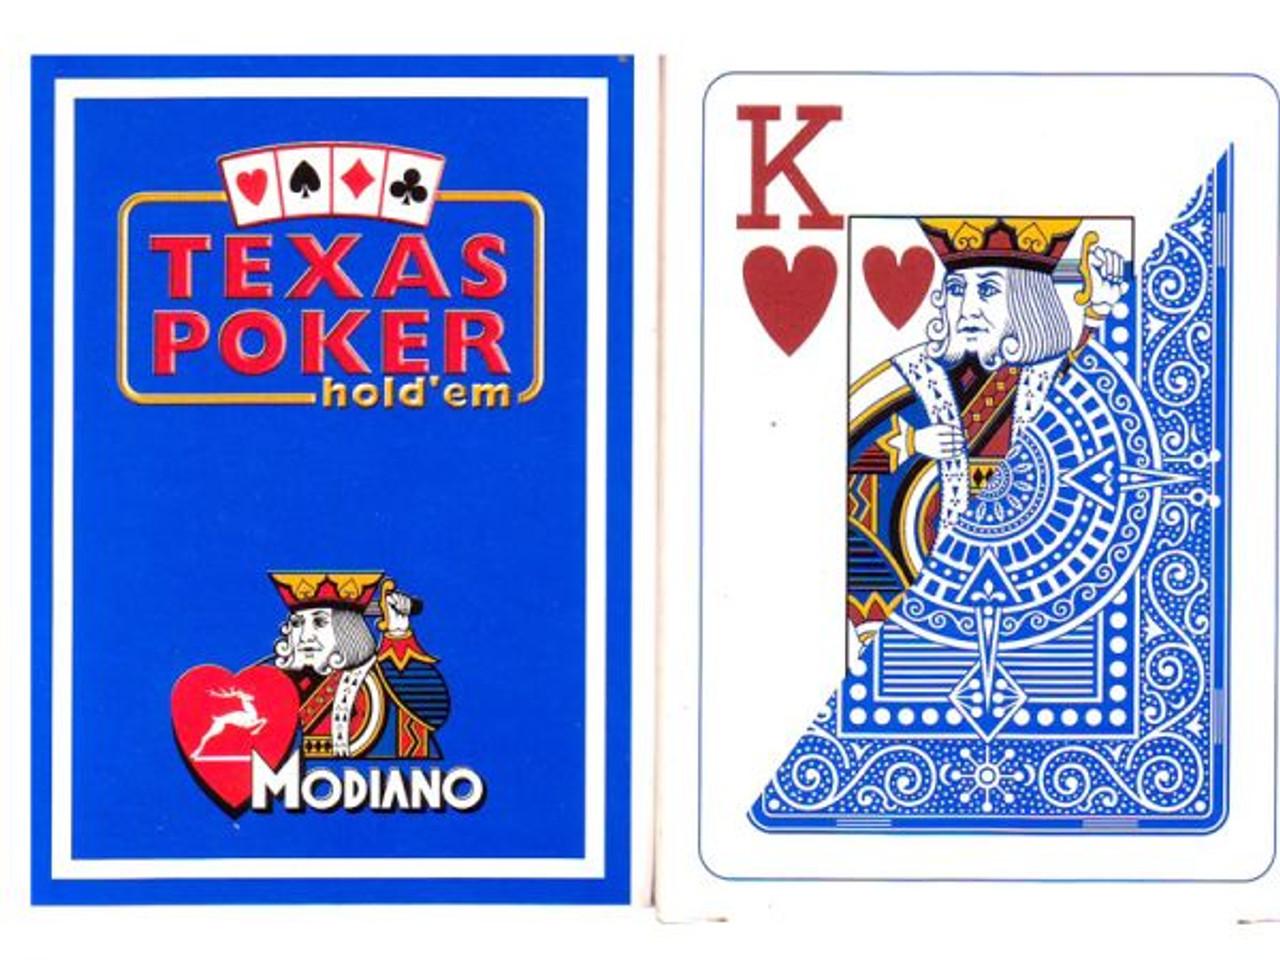 Carti de Texas Holdem 100% plastic, cu index mare albastru deschis